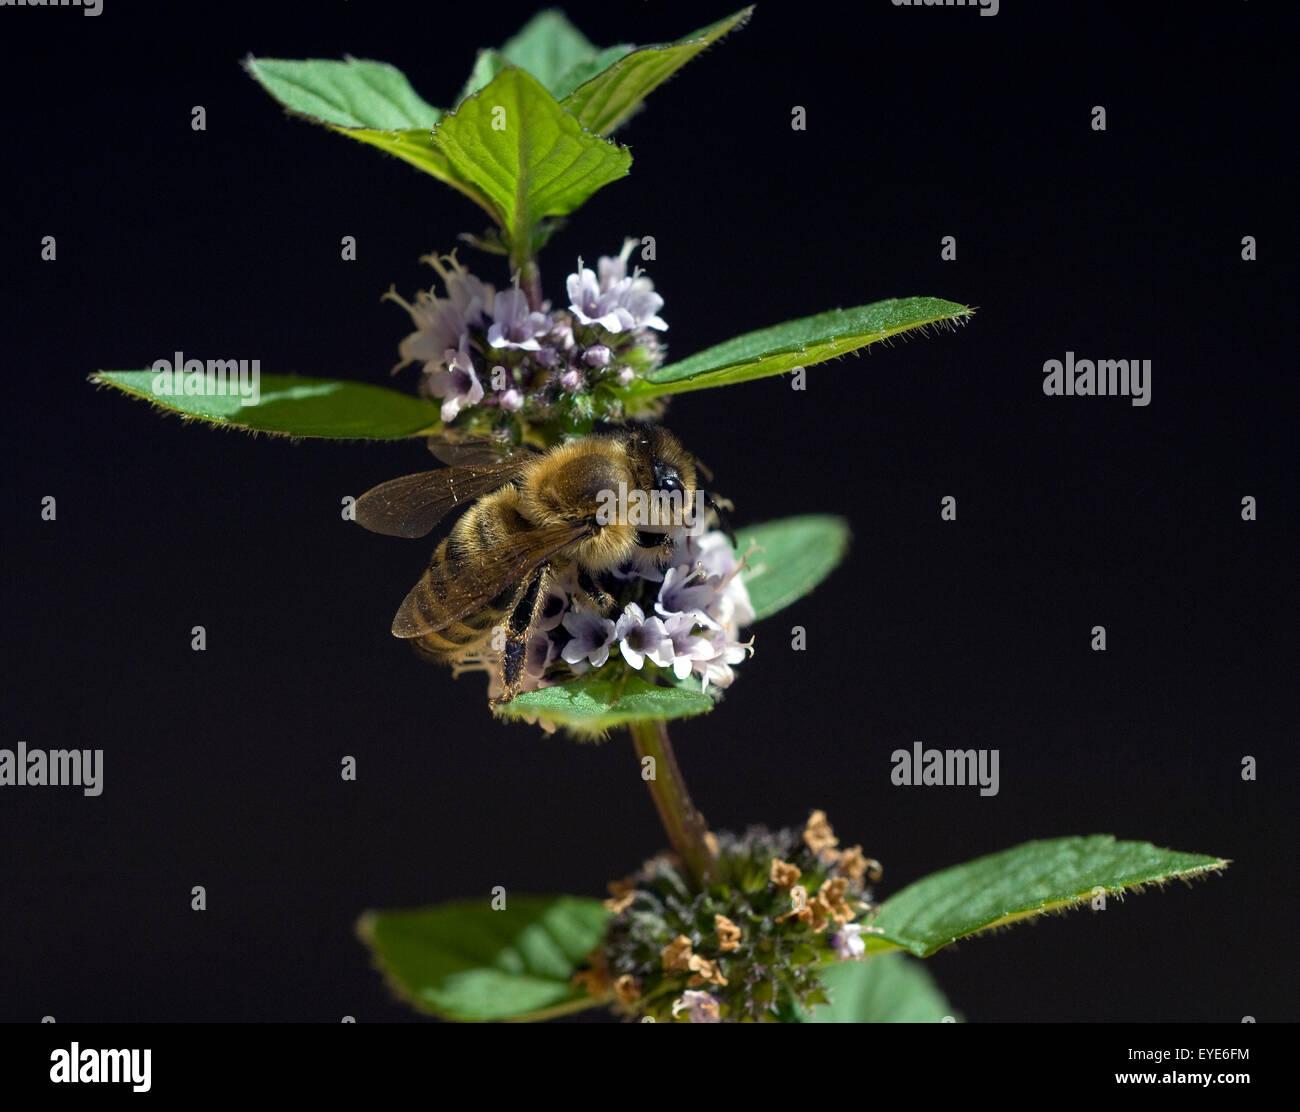 Biene; Apis, mellifera; Honigbiene; Insekt; Pfefferminze, Mentha piperita, Stock Photo